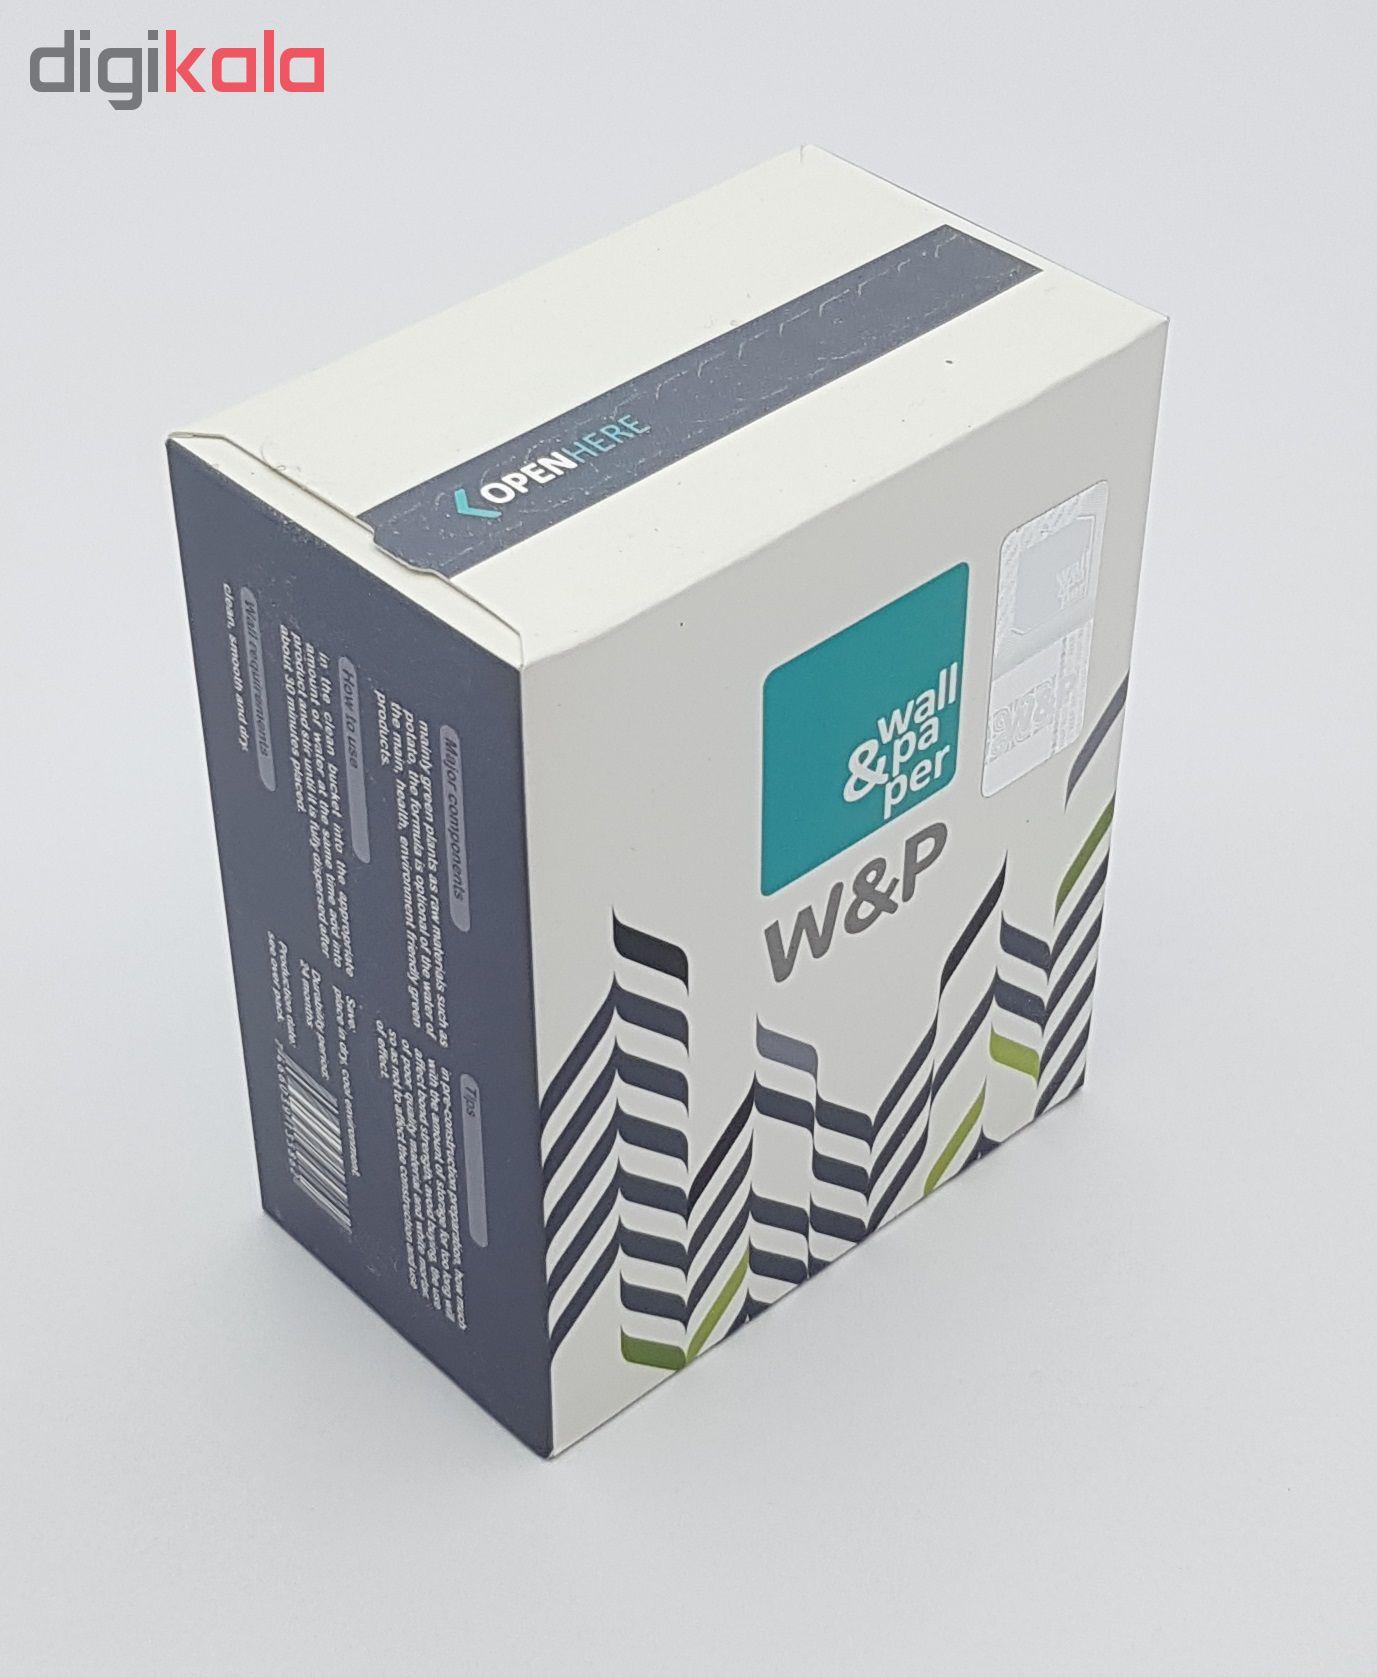 چسب کاغذ دیواری دبلیو اند پی مدل wp2 وزن 250 گرم